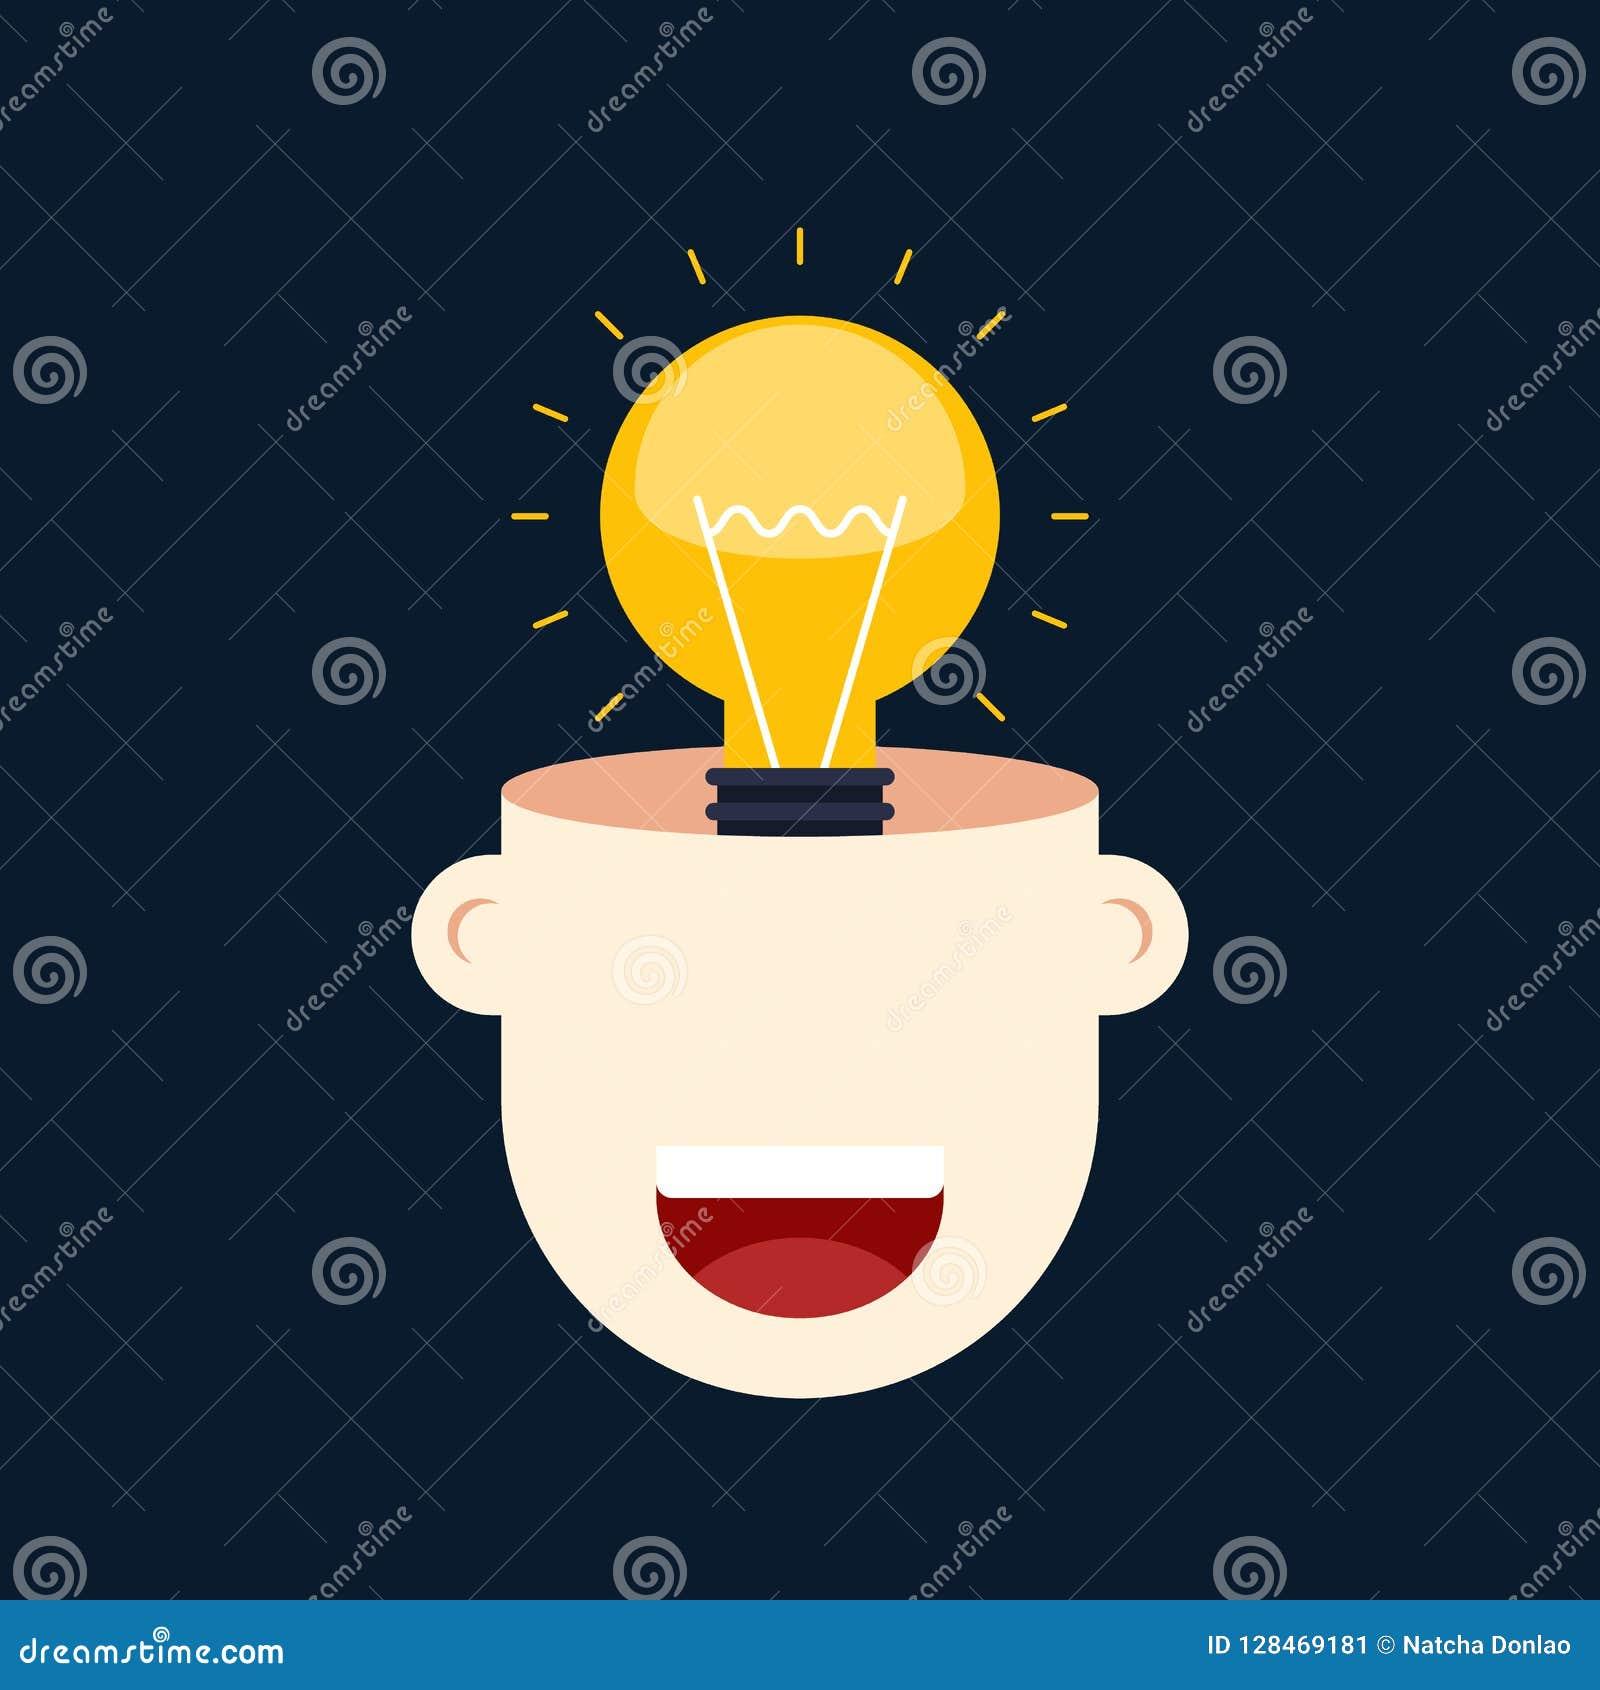 Creative Thinking Idea Concept Flat Design Stock Illustration Illustration Of Modern Light 128469181